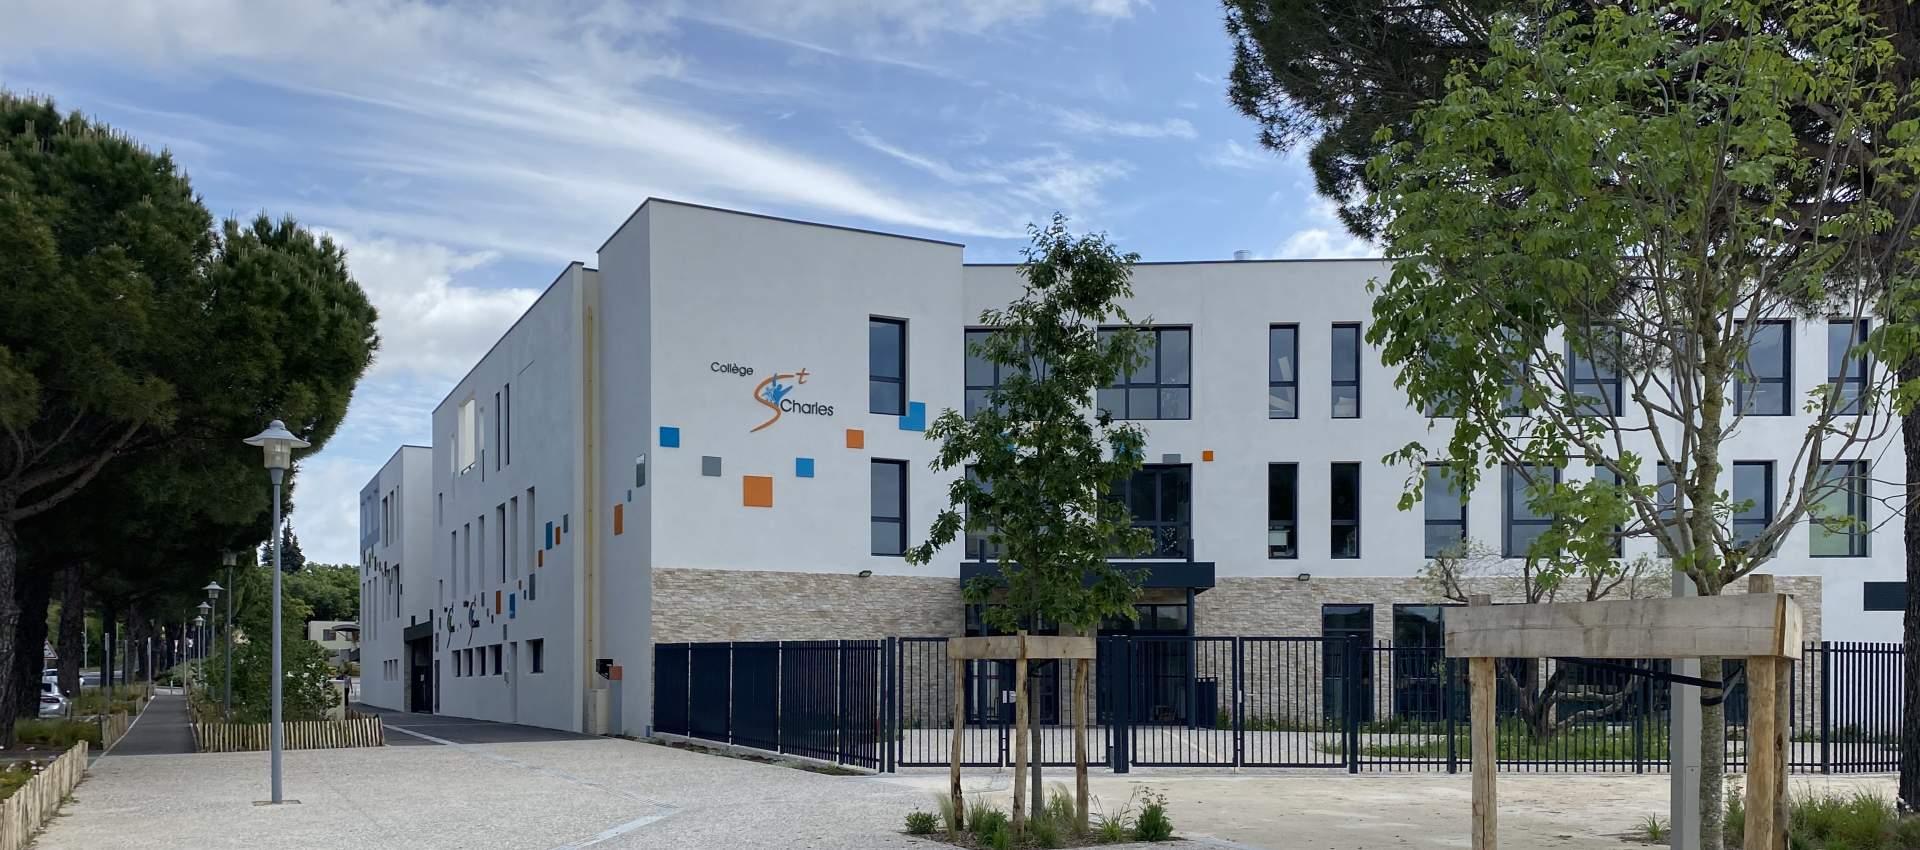 Collège Saint Charles